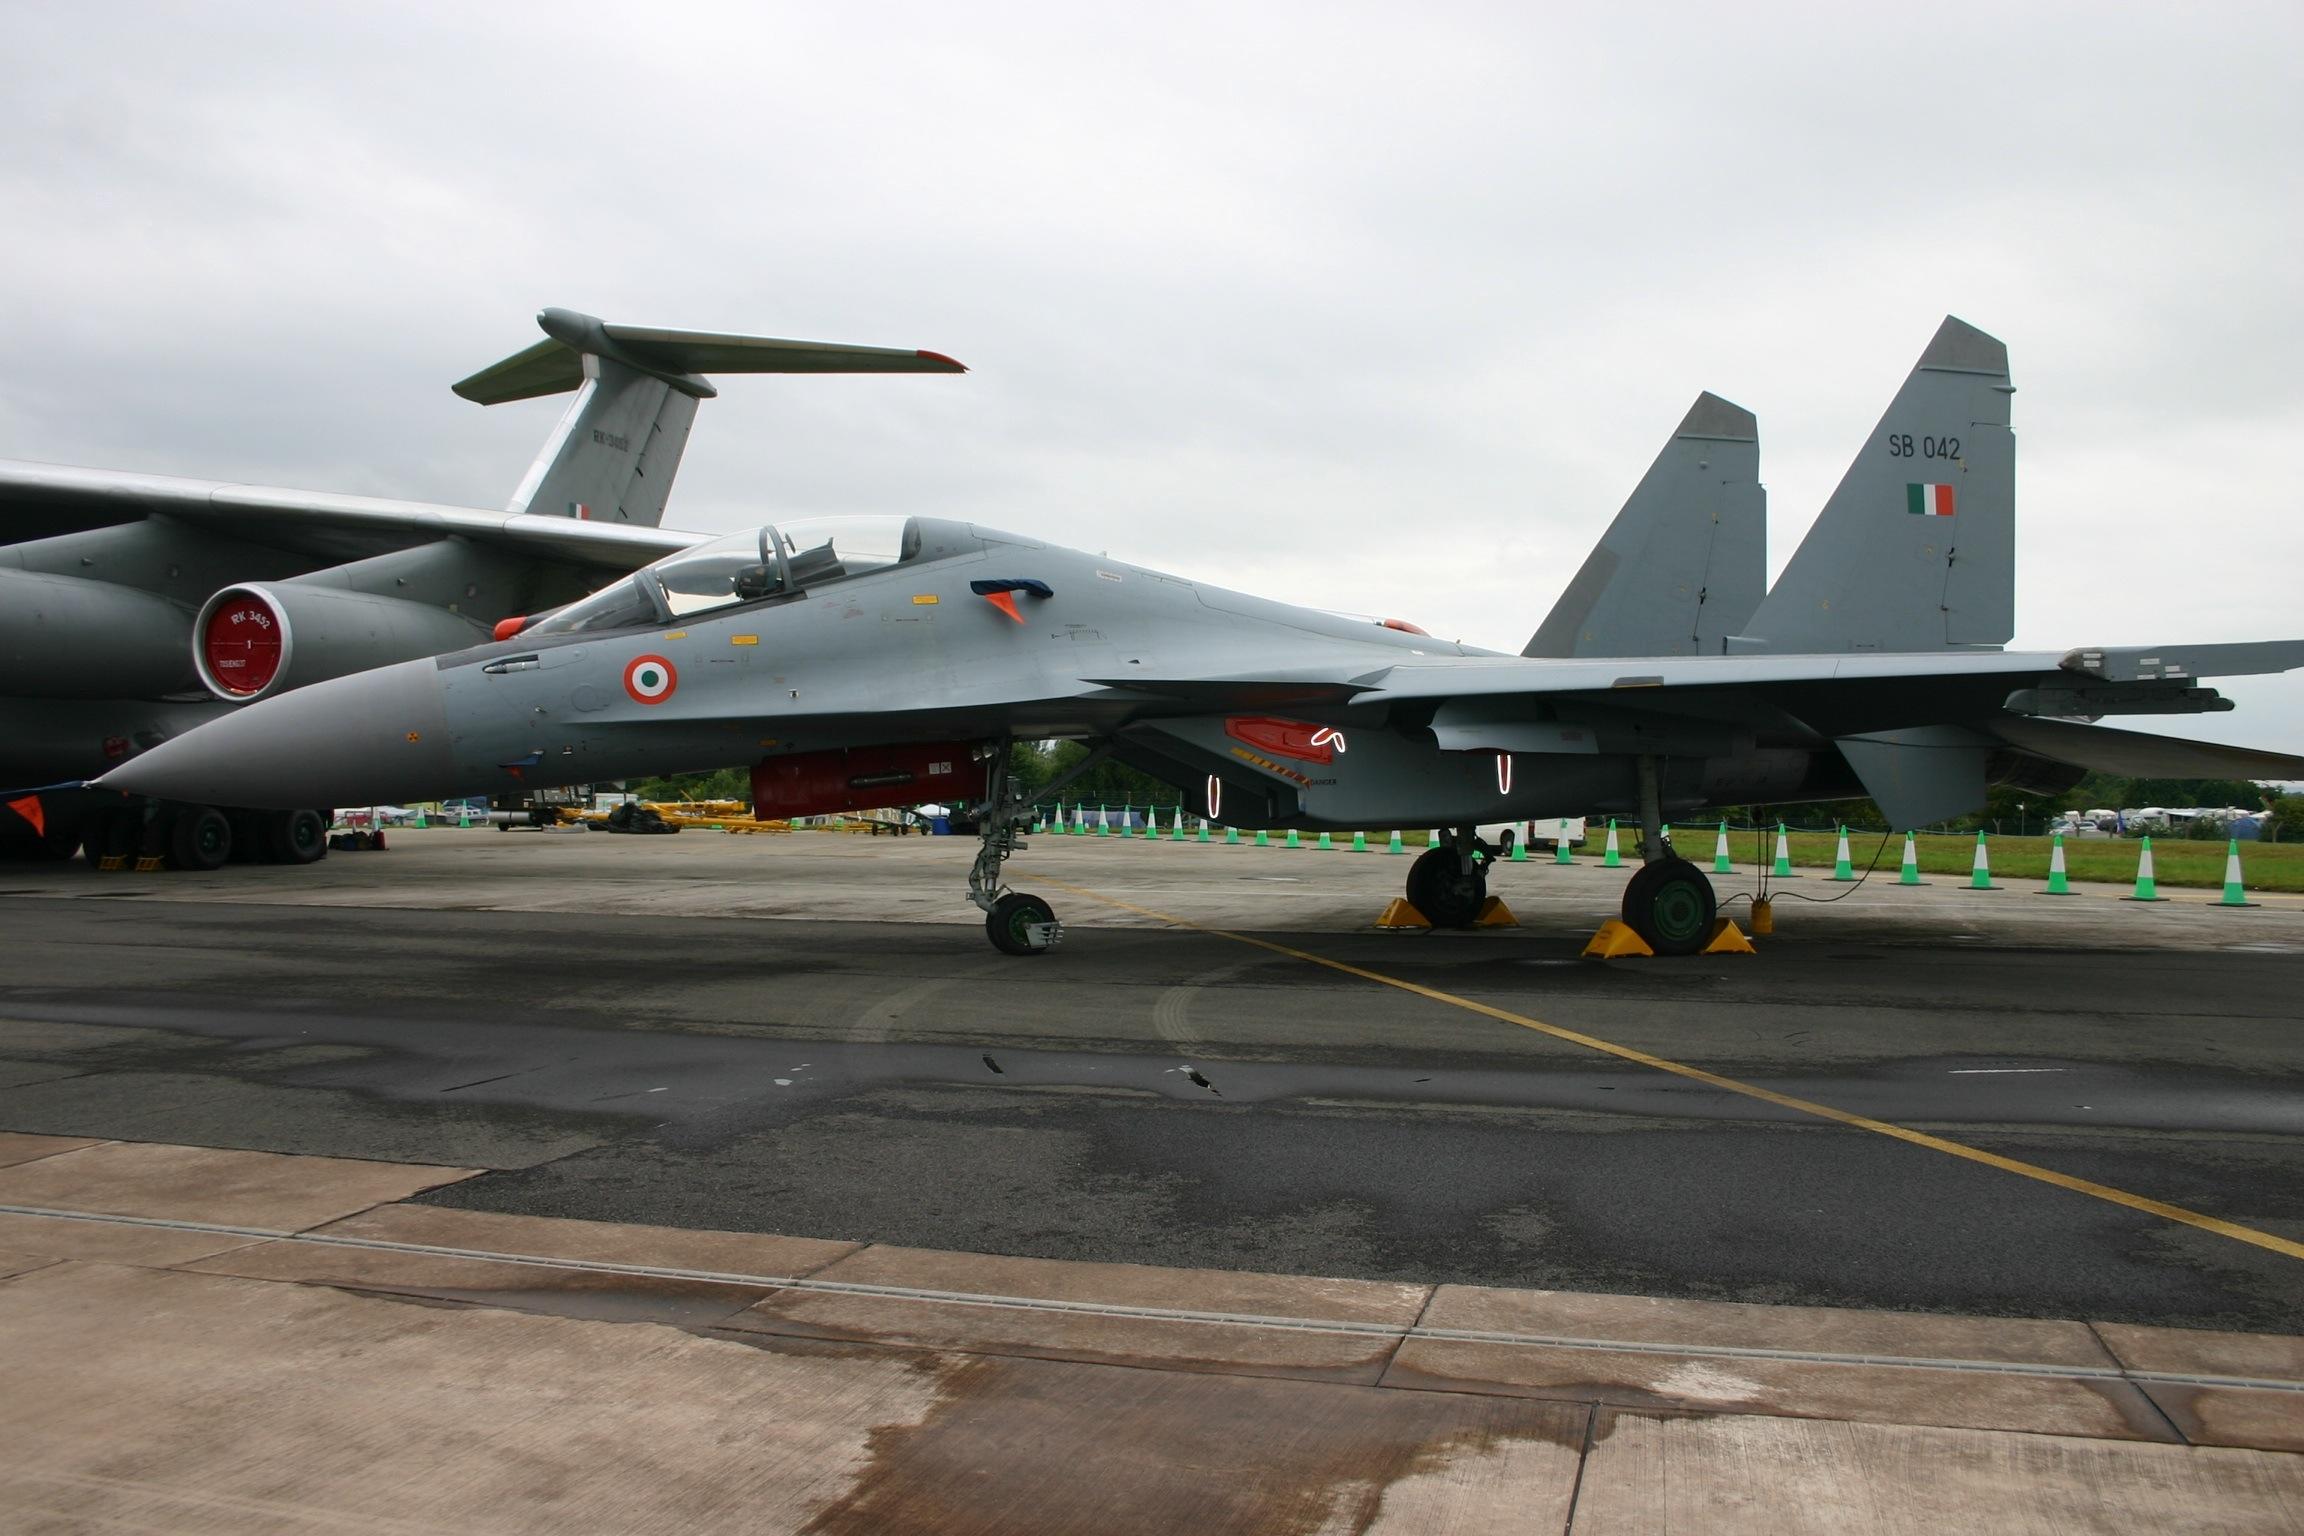 File:SB042 Sukhoi Su-30 MKI Indian Airforce (7731435994).jpg - Wikimedia Commons